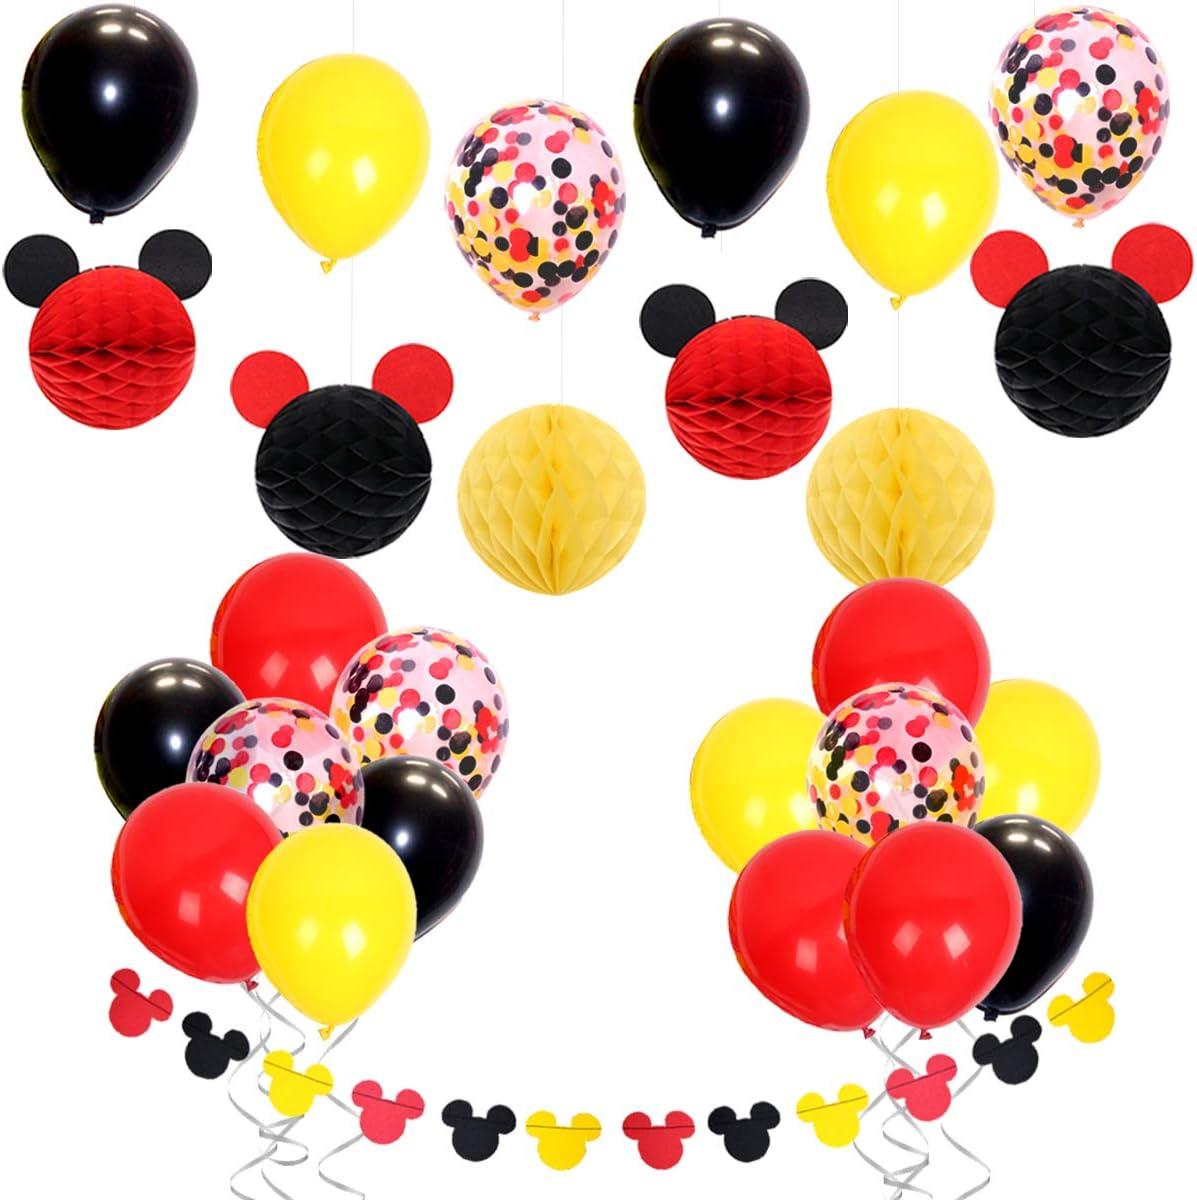 Amazon.com: Mickey Mouse decoración de fiesta con globos de ...